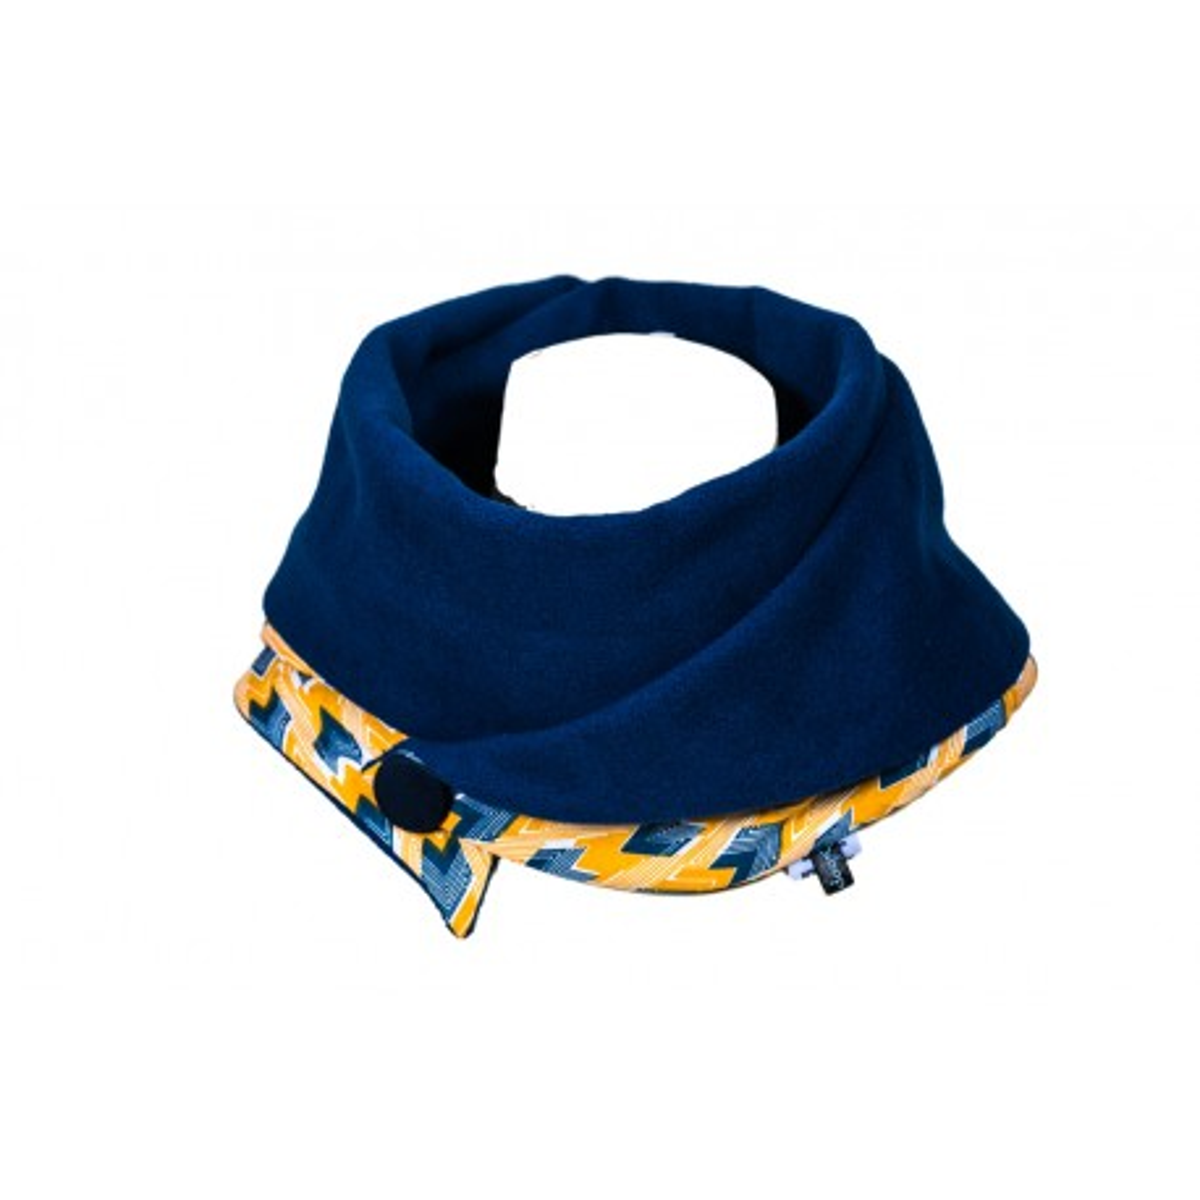 Echarpe polaire femme tissu fantaisie jaune et bleu